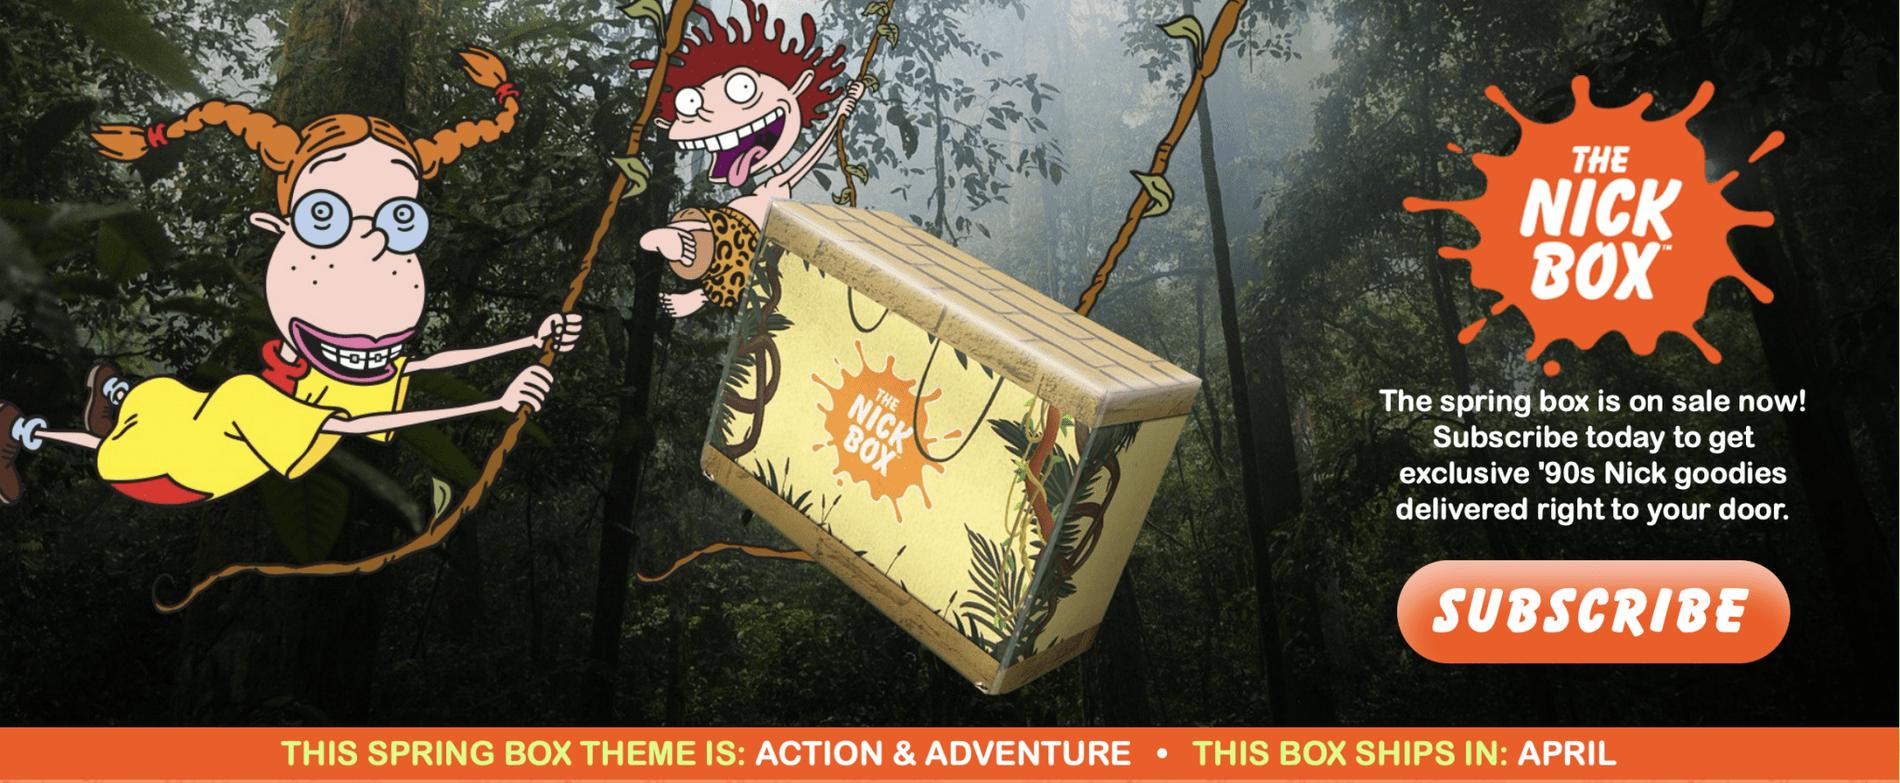 The Nick Box Spring 2021 Box – On Sale Now + Theme Spoiler